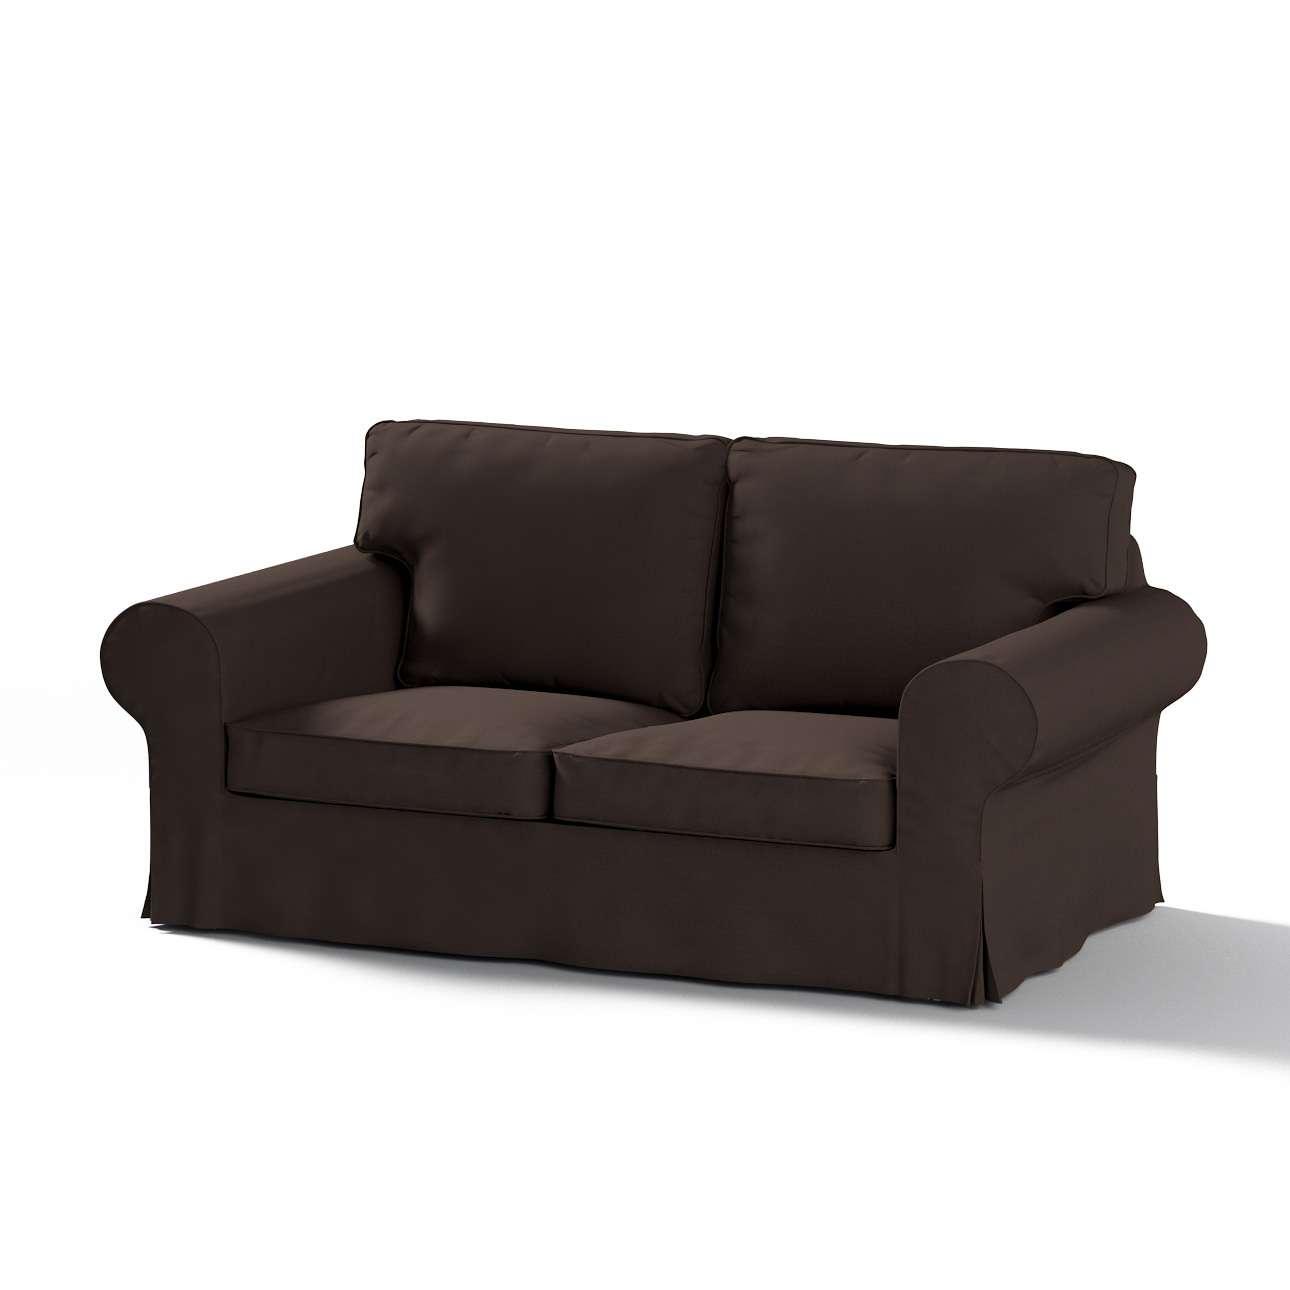 Ektorp betræk 2 sæder sovesofa gammel model<br/>Bredde ca 195cm fra kollektionen Cotton Panama, Stof: 702-03